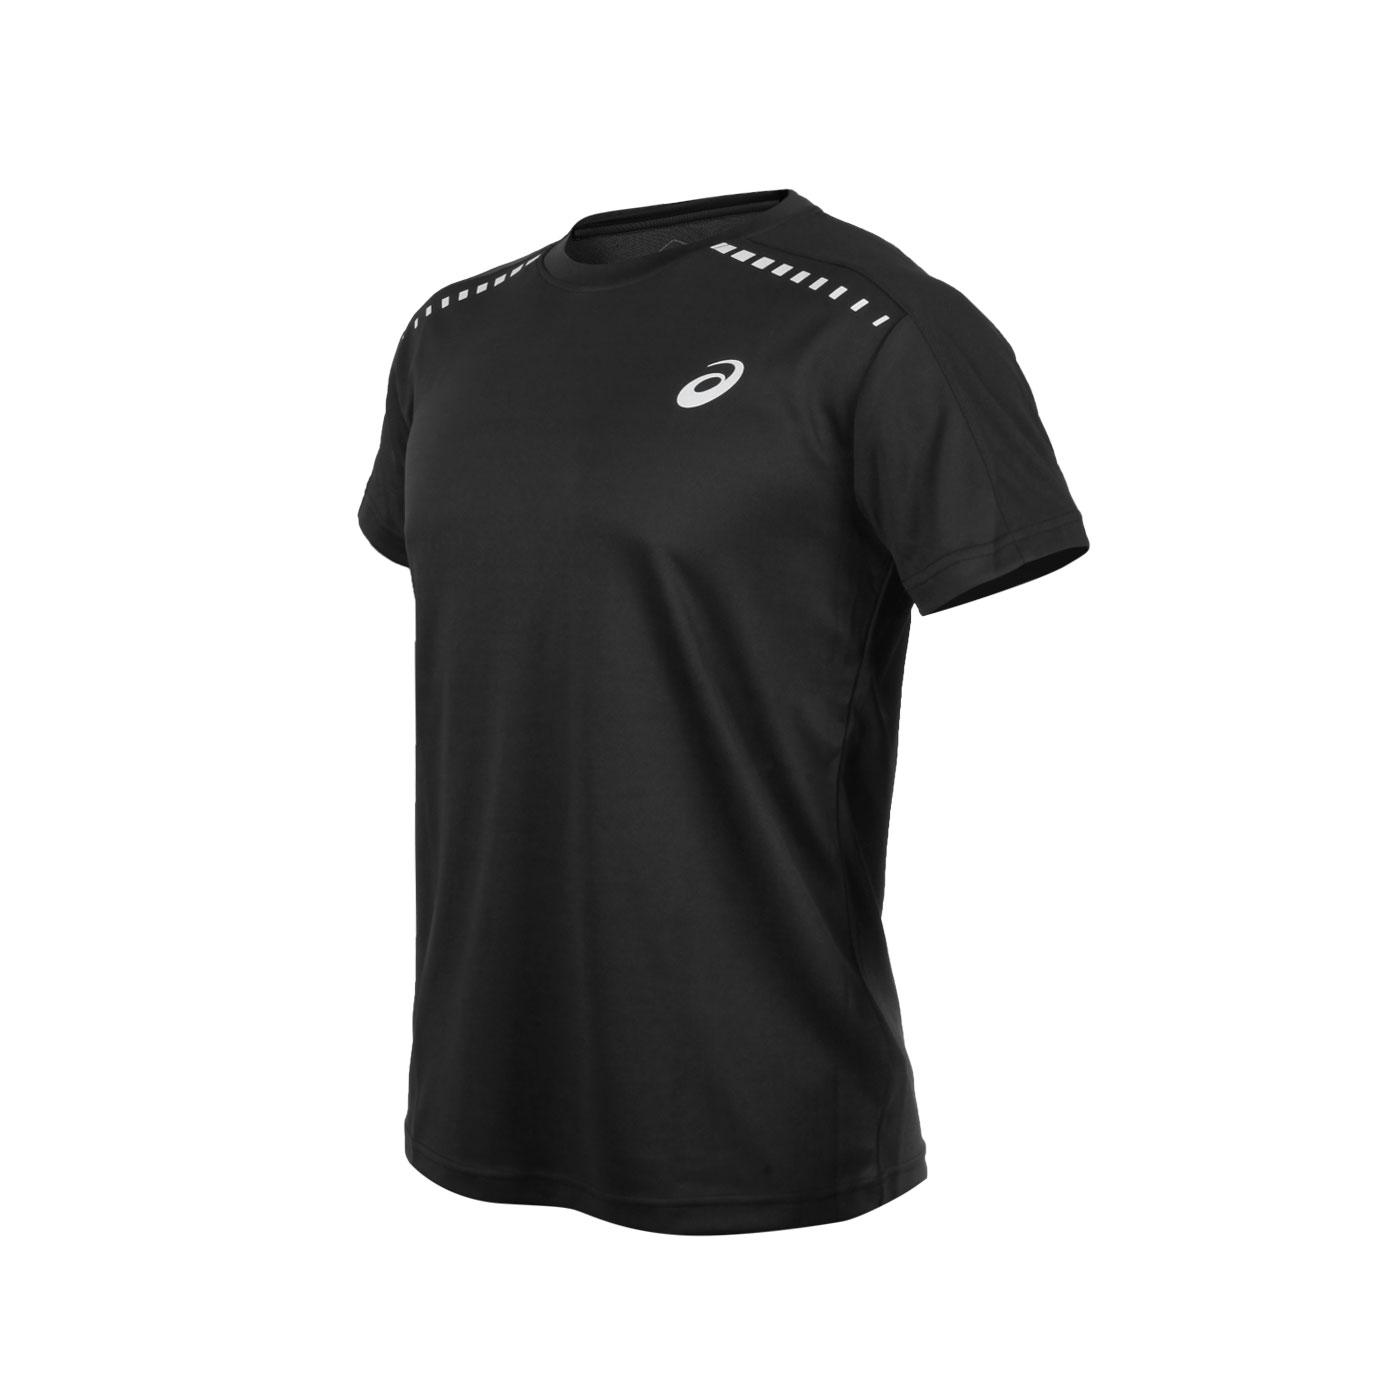 ASICS 男款短袖T恤 2013A176-001